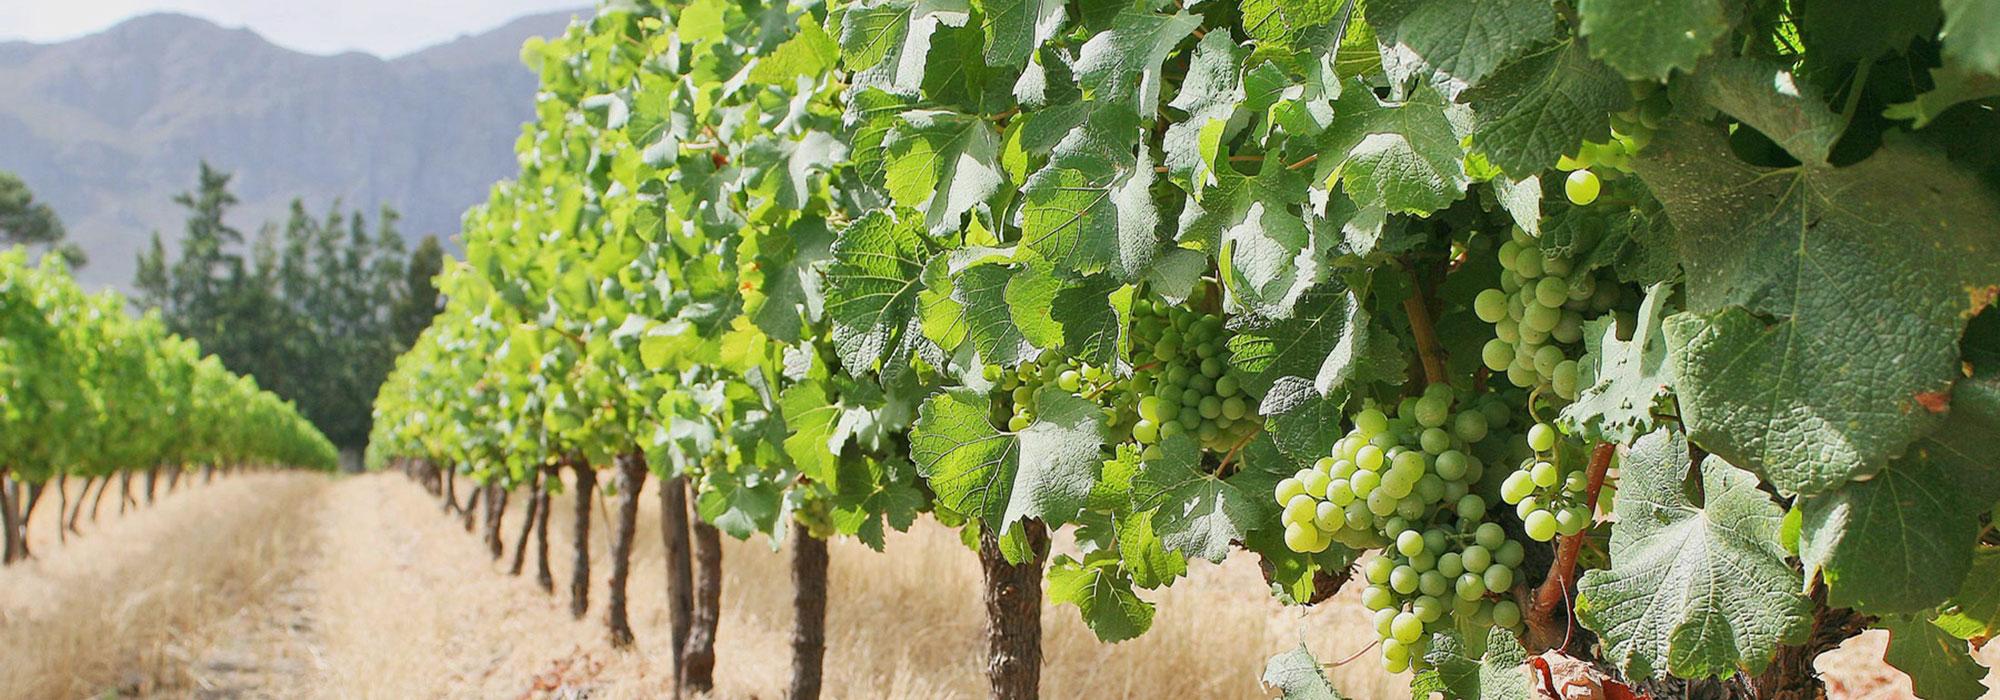 Explore Cape Town and the Wine Region